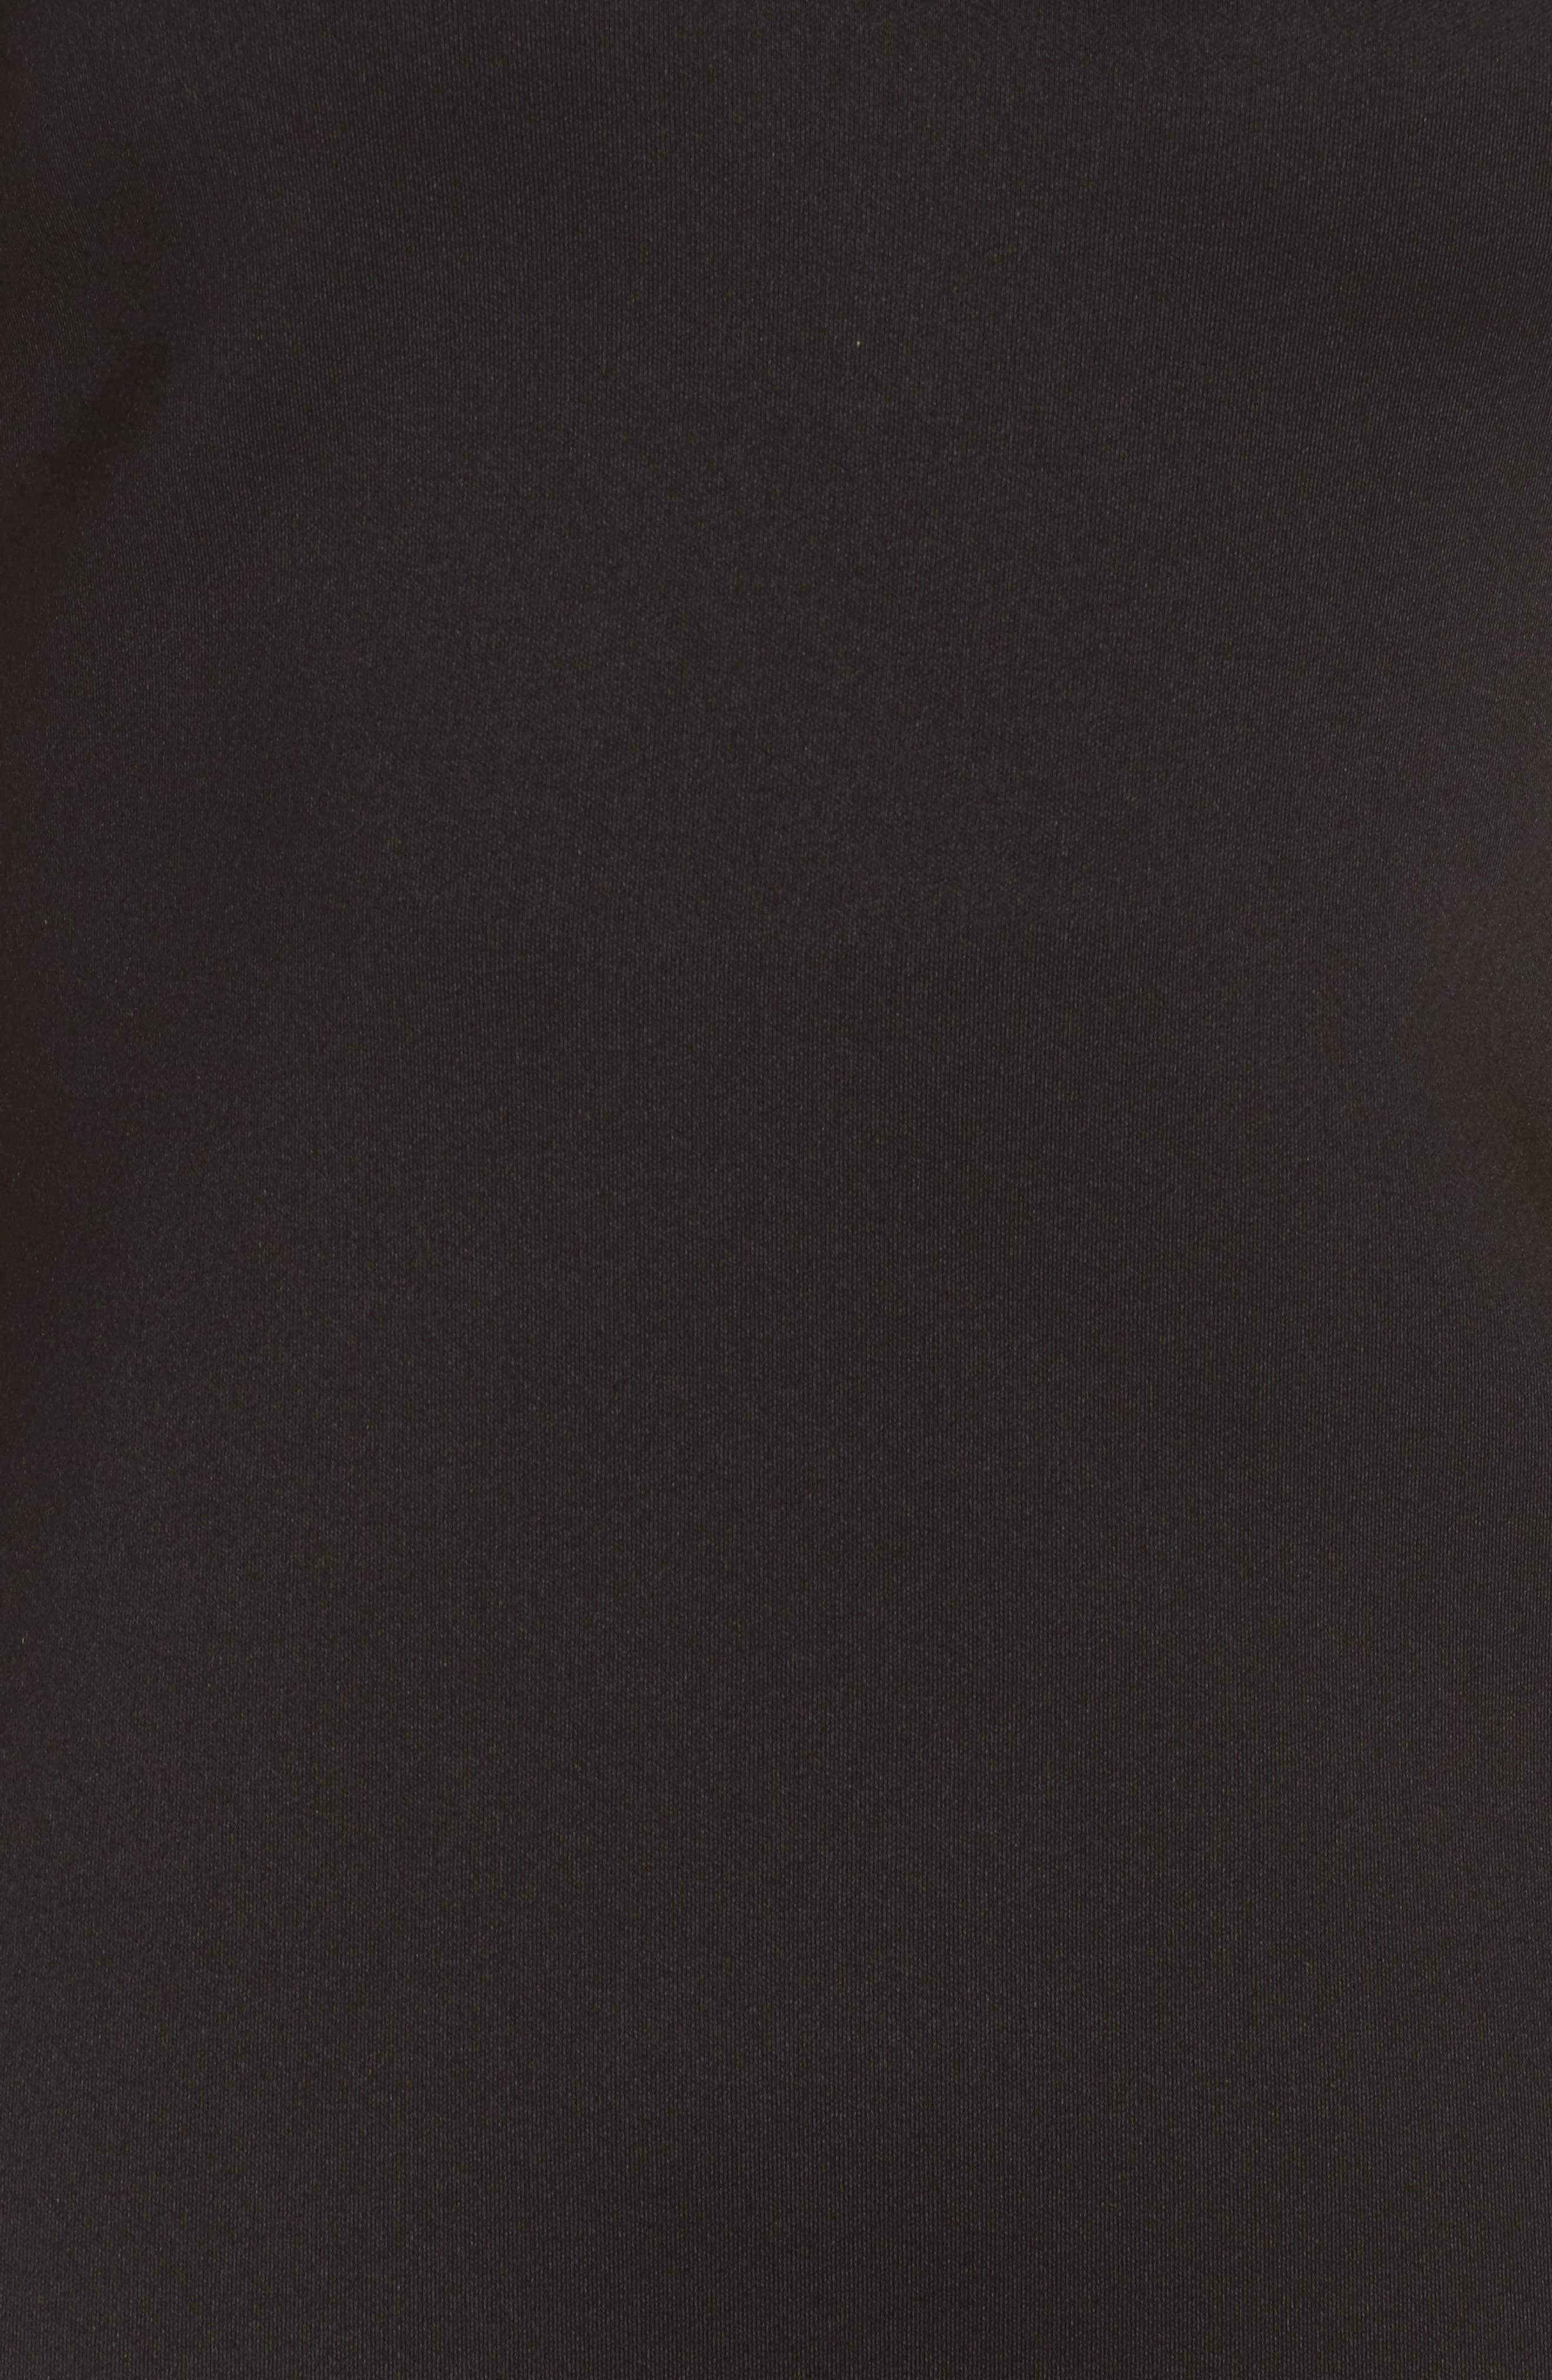 One-Shoulder Sheath Dress,                             Alternate thumbnail 5, color,                             BLACK